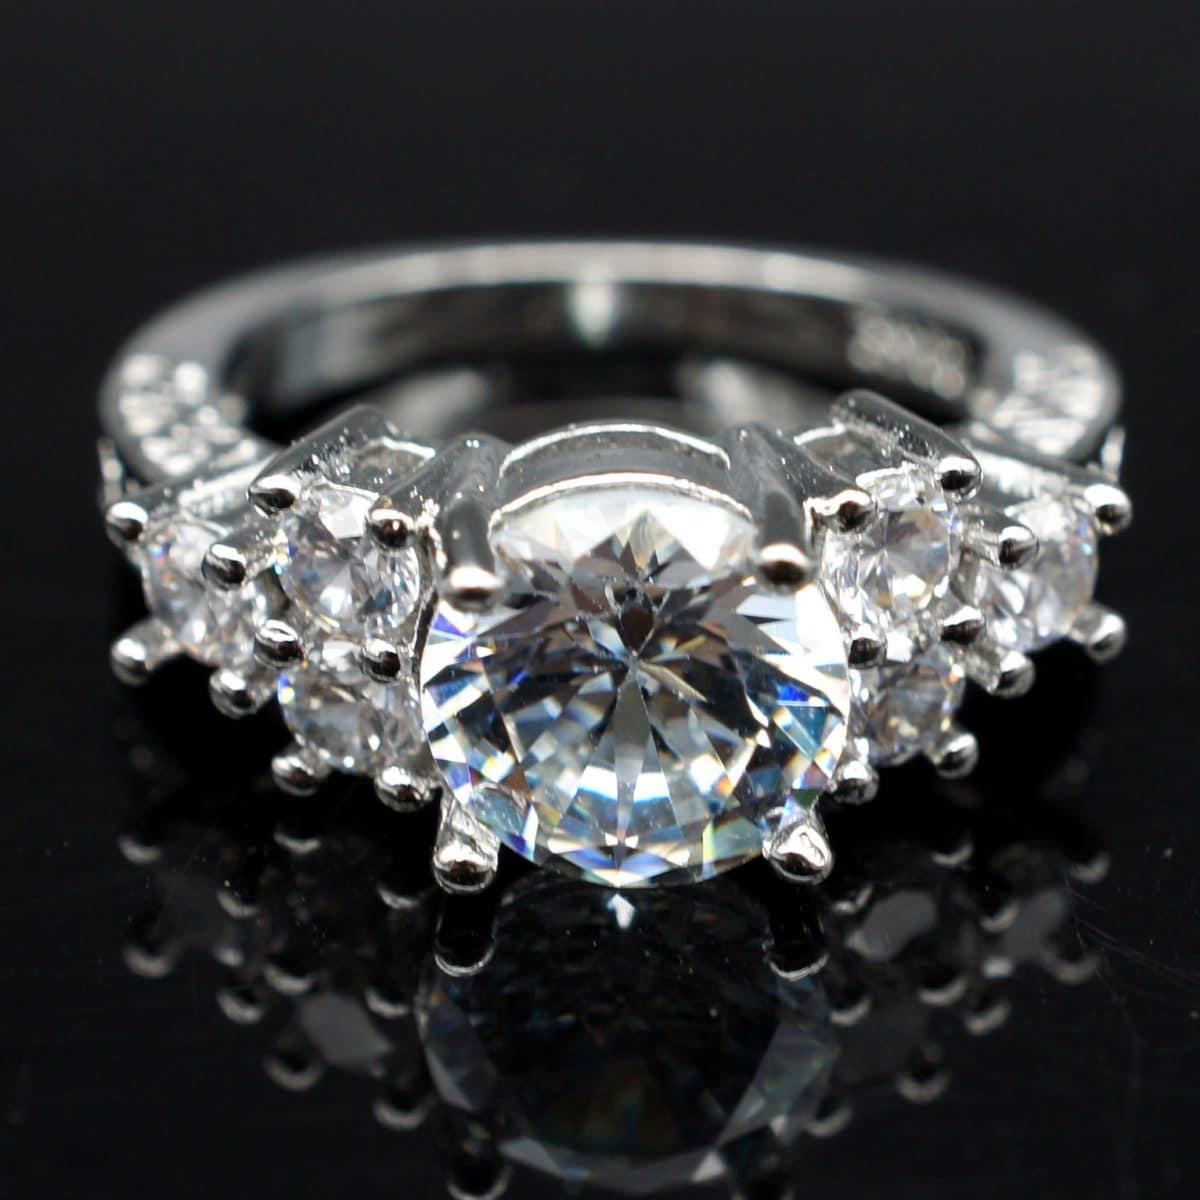 Ebay hot selling diamond hand ornaments